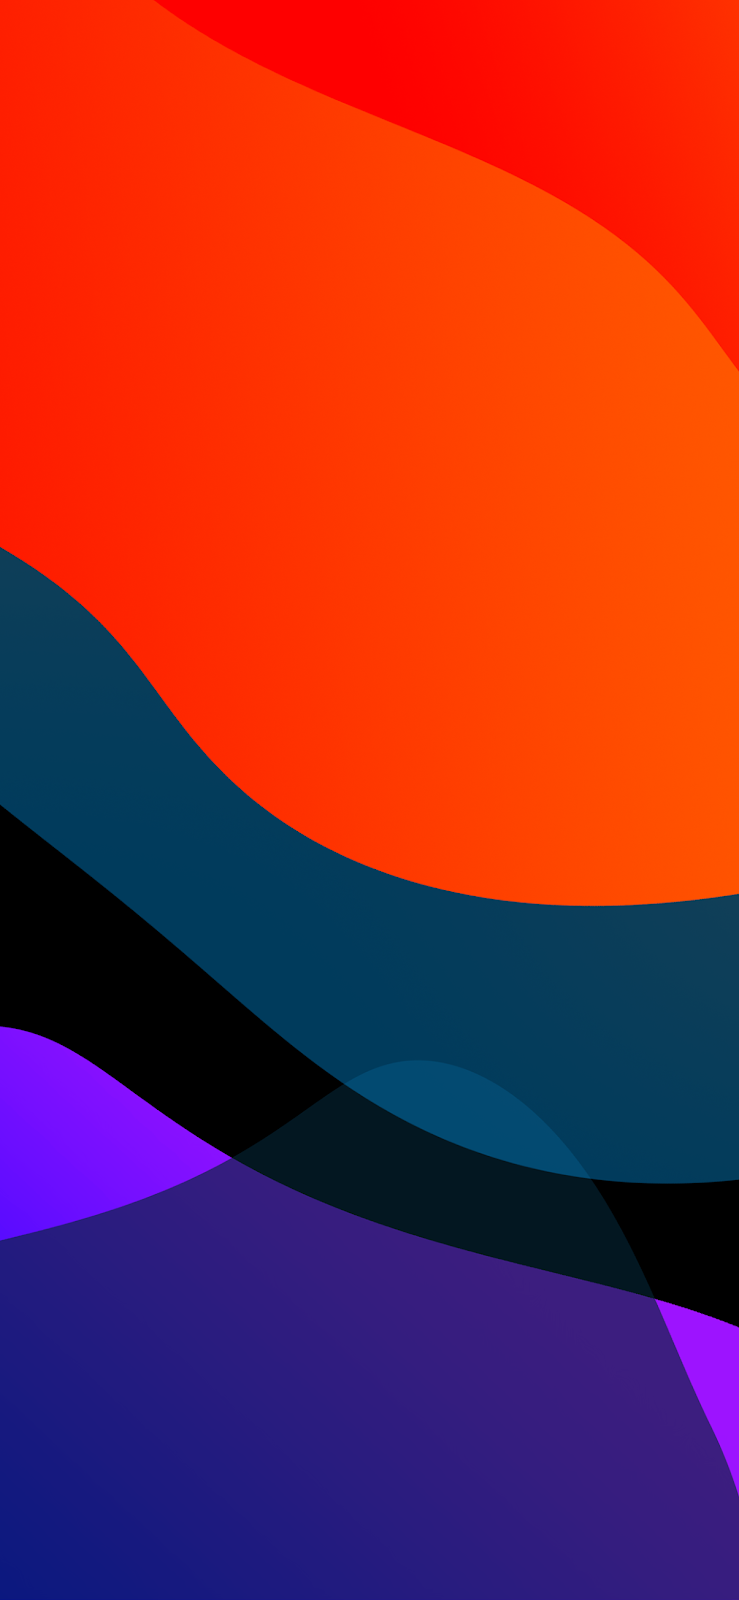 Geometric Curves Ios13 Inspired By Ar72014 Hd Phone Wallpapers Cellphone Wallpaper Android Phone Wallpaper